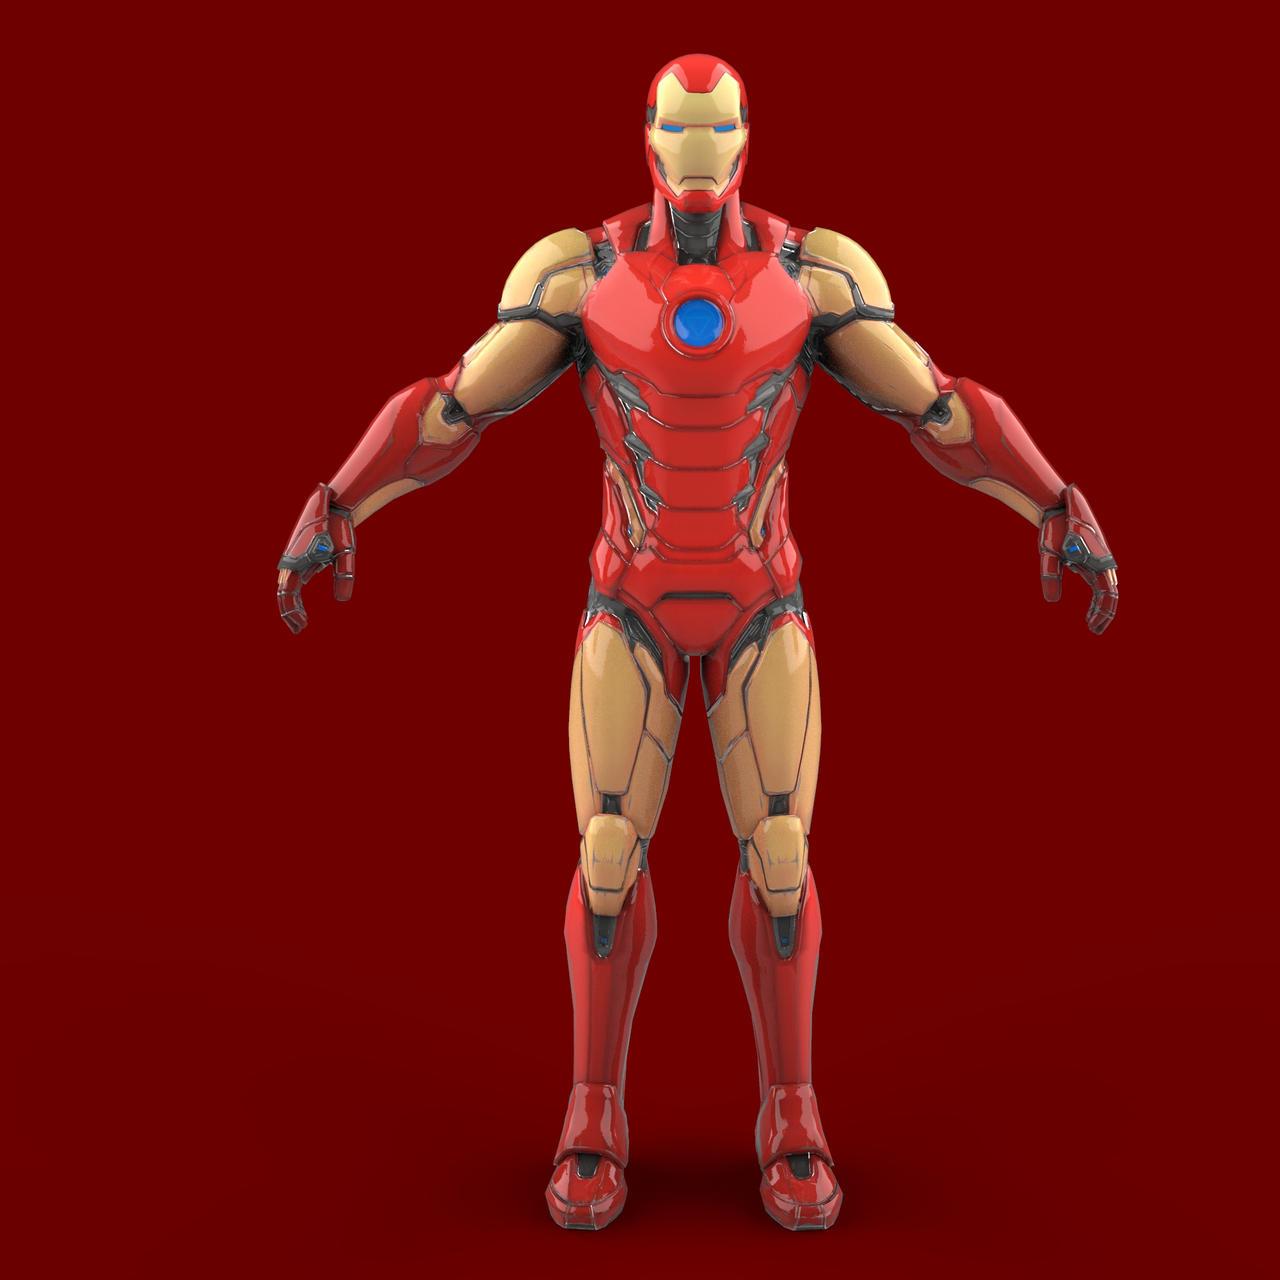 Fortnite Iron Man Armor Pepakura Eva Foam Template By Evafoammaster On Deviantart Max iron man skin gameplay in fortnite gameplay featuring : fortnite iron man armor pepakura eva